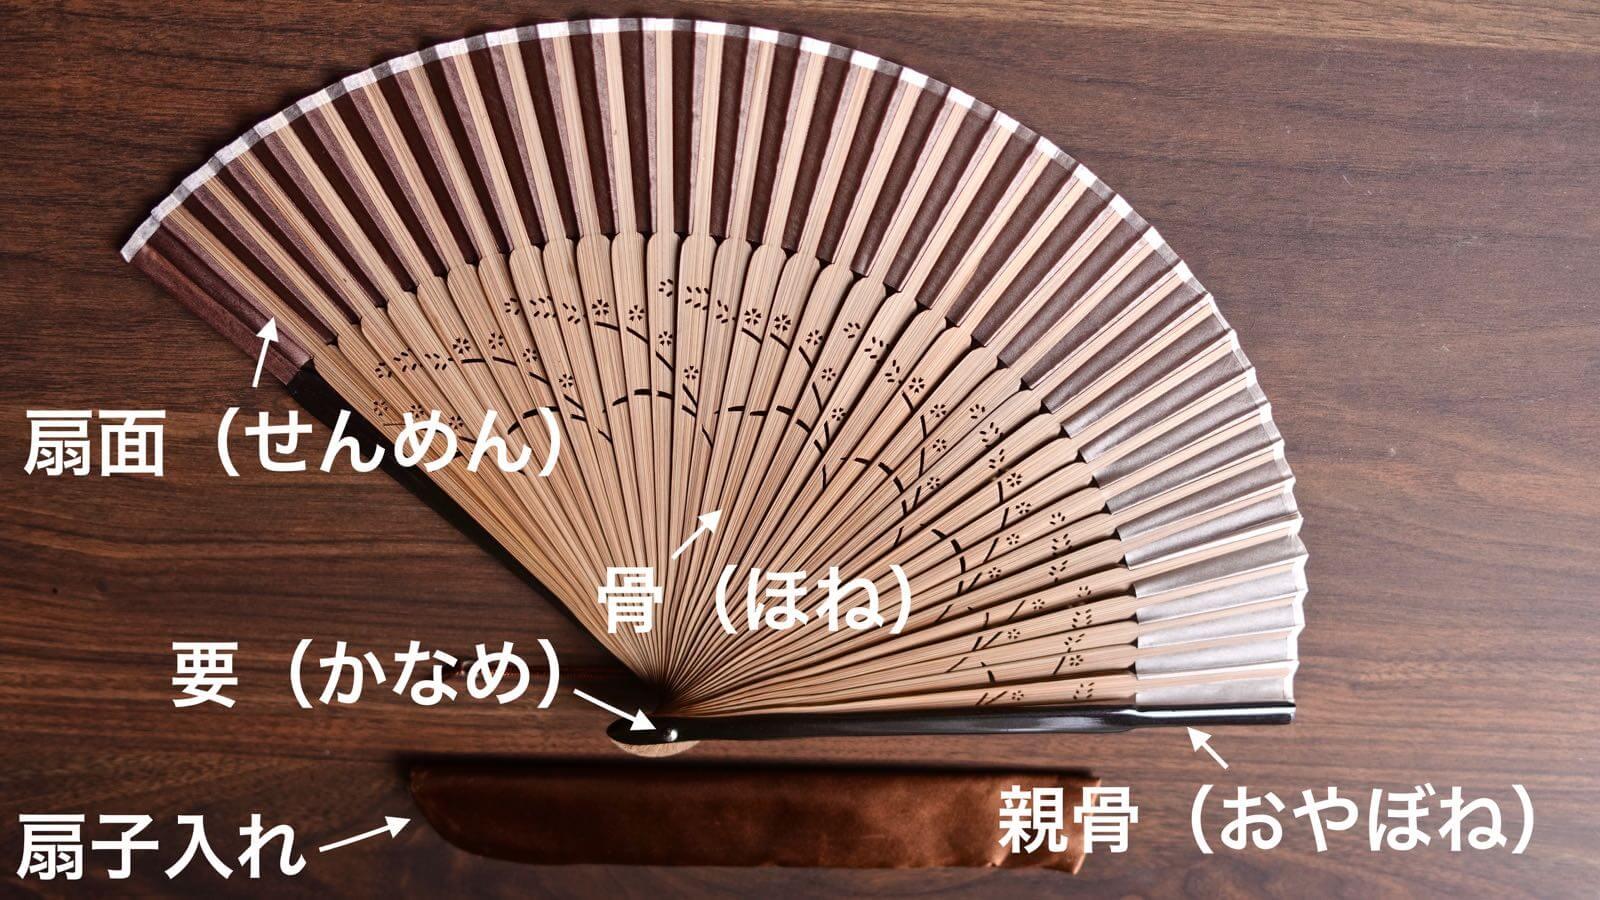 0094 Sakura Silk Folding fan Review 03